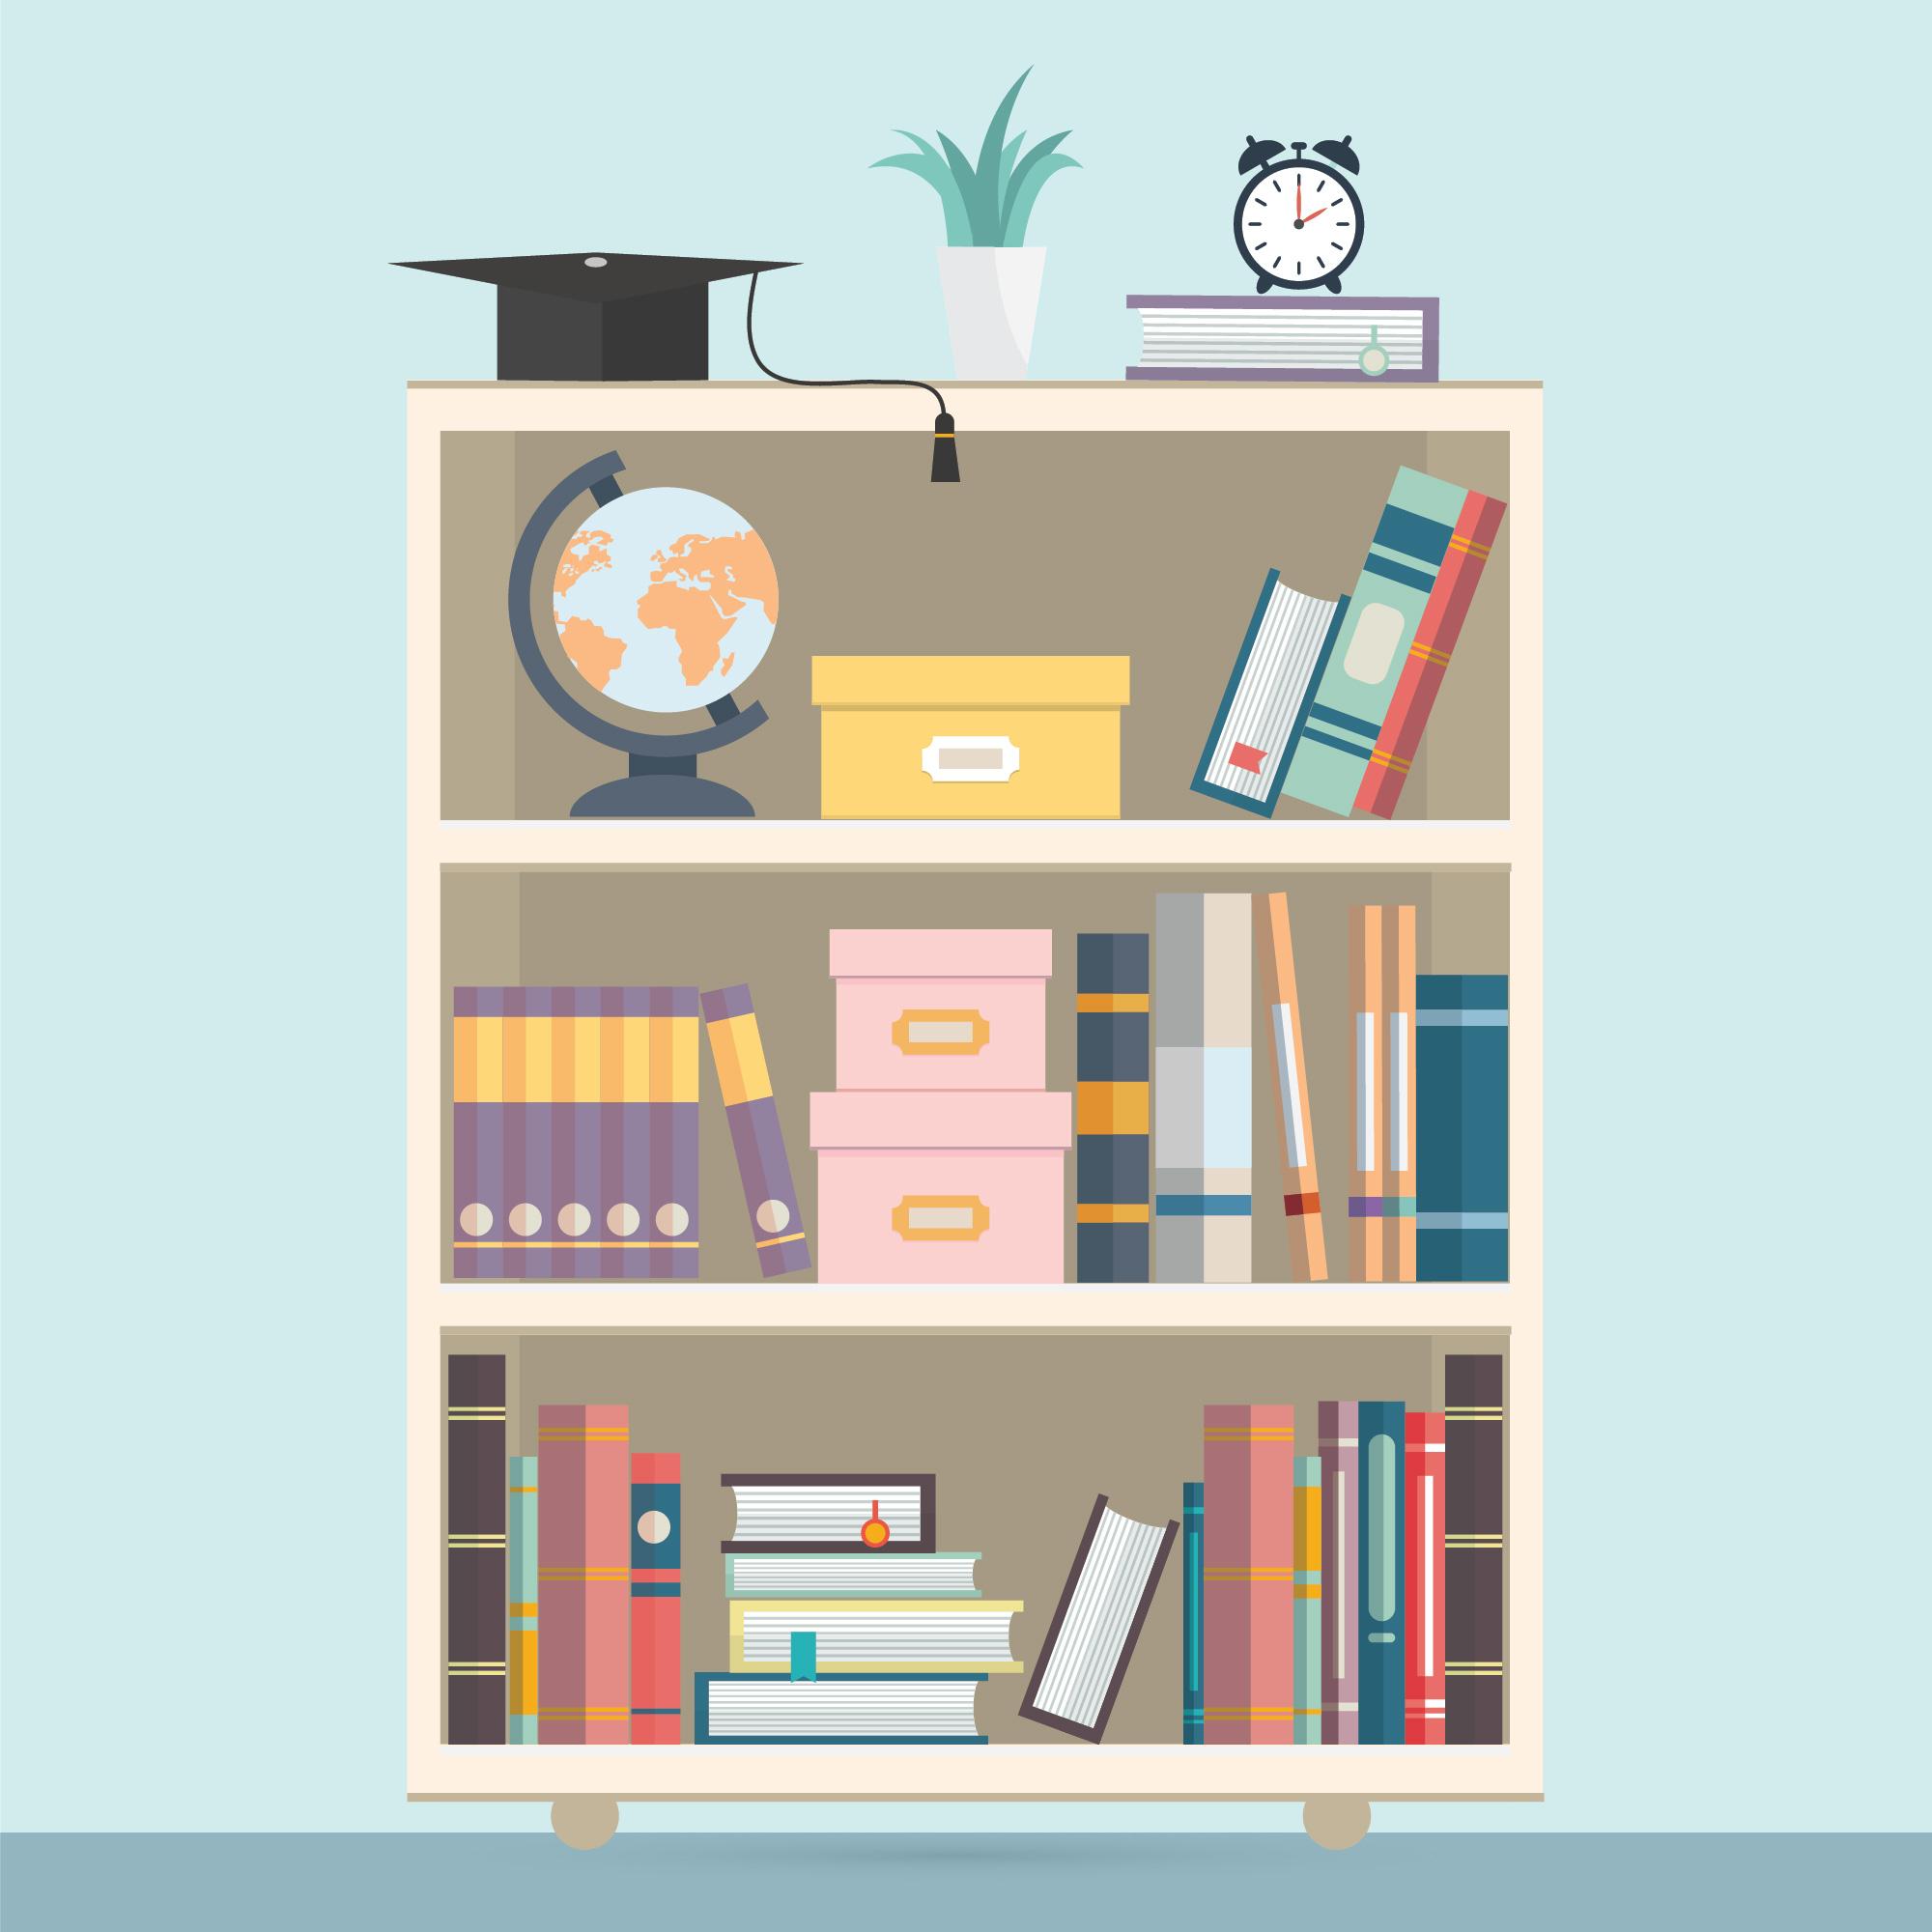 Bookshelf Illustration Vector - Download Free Vectors ...